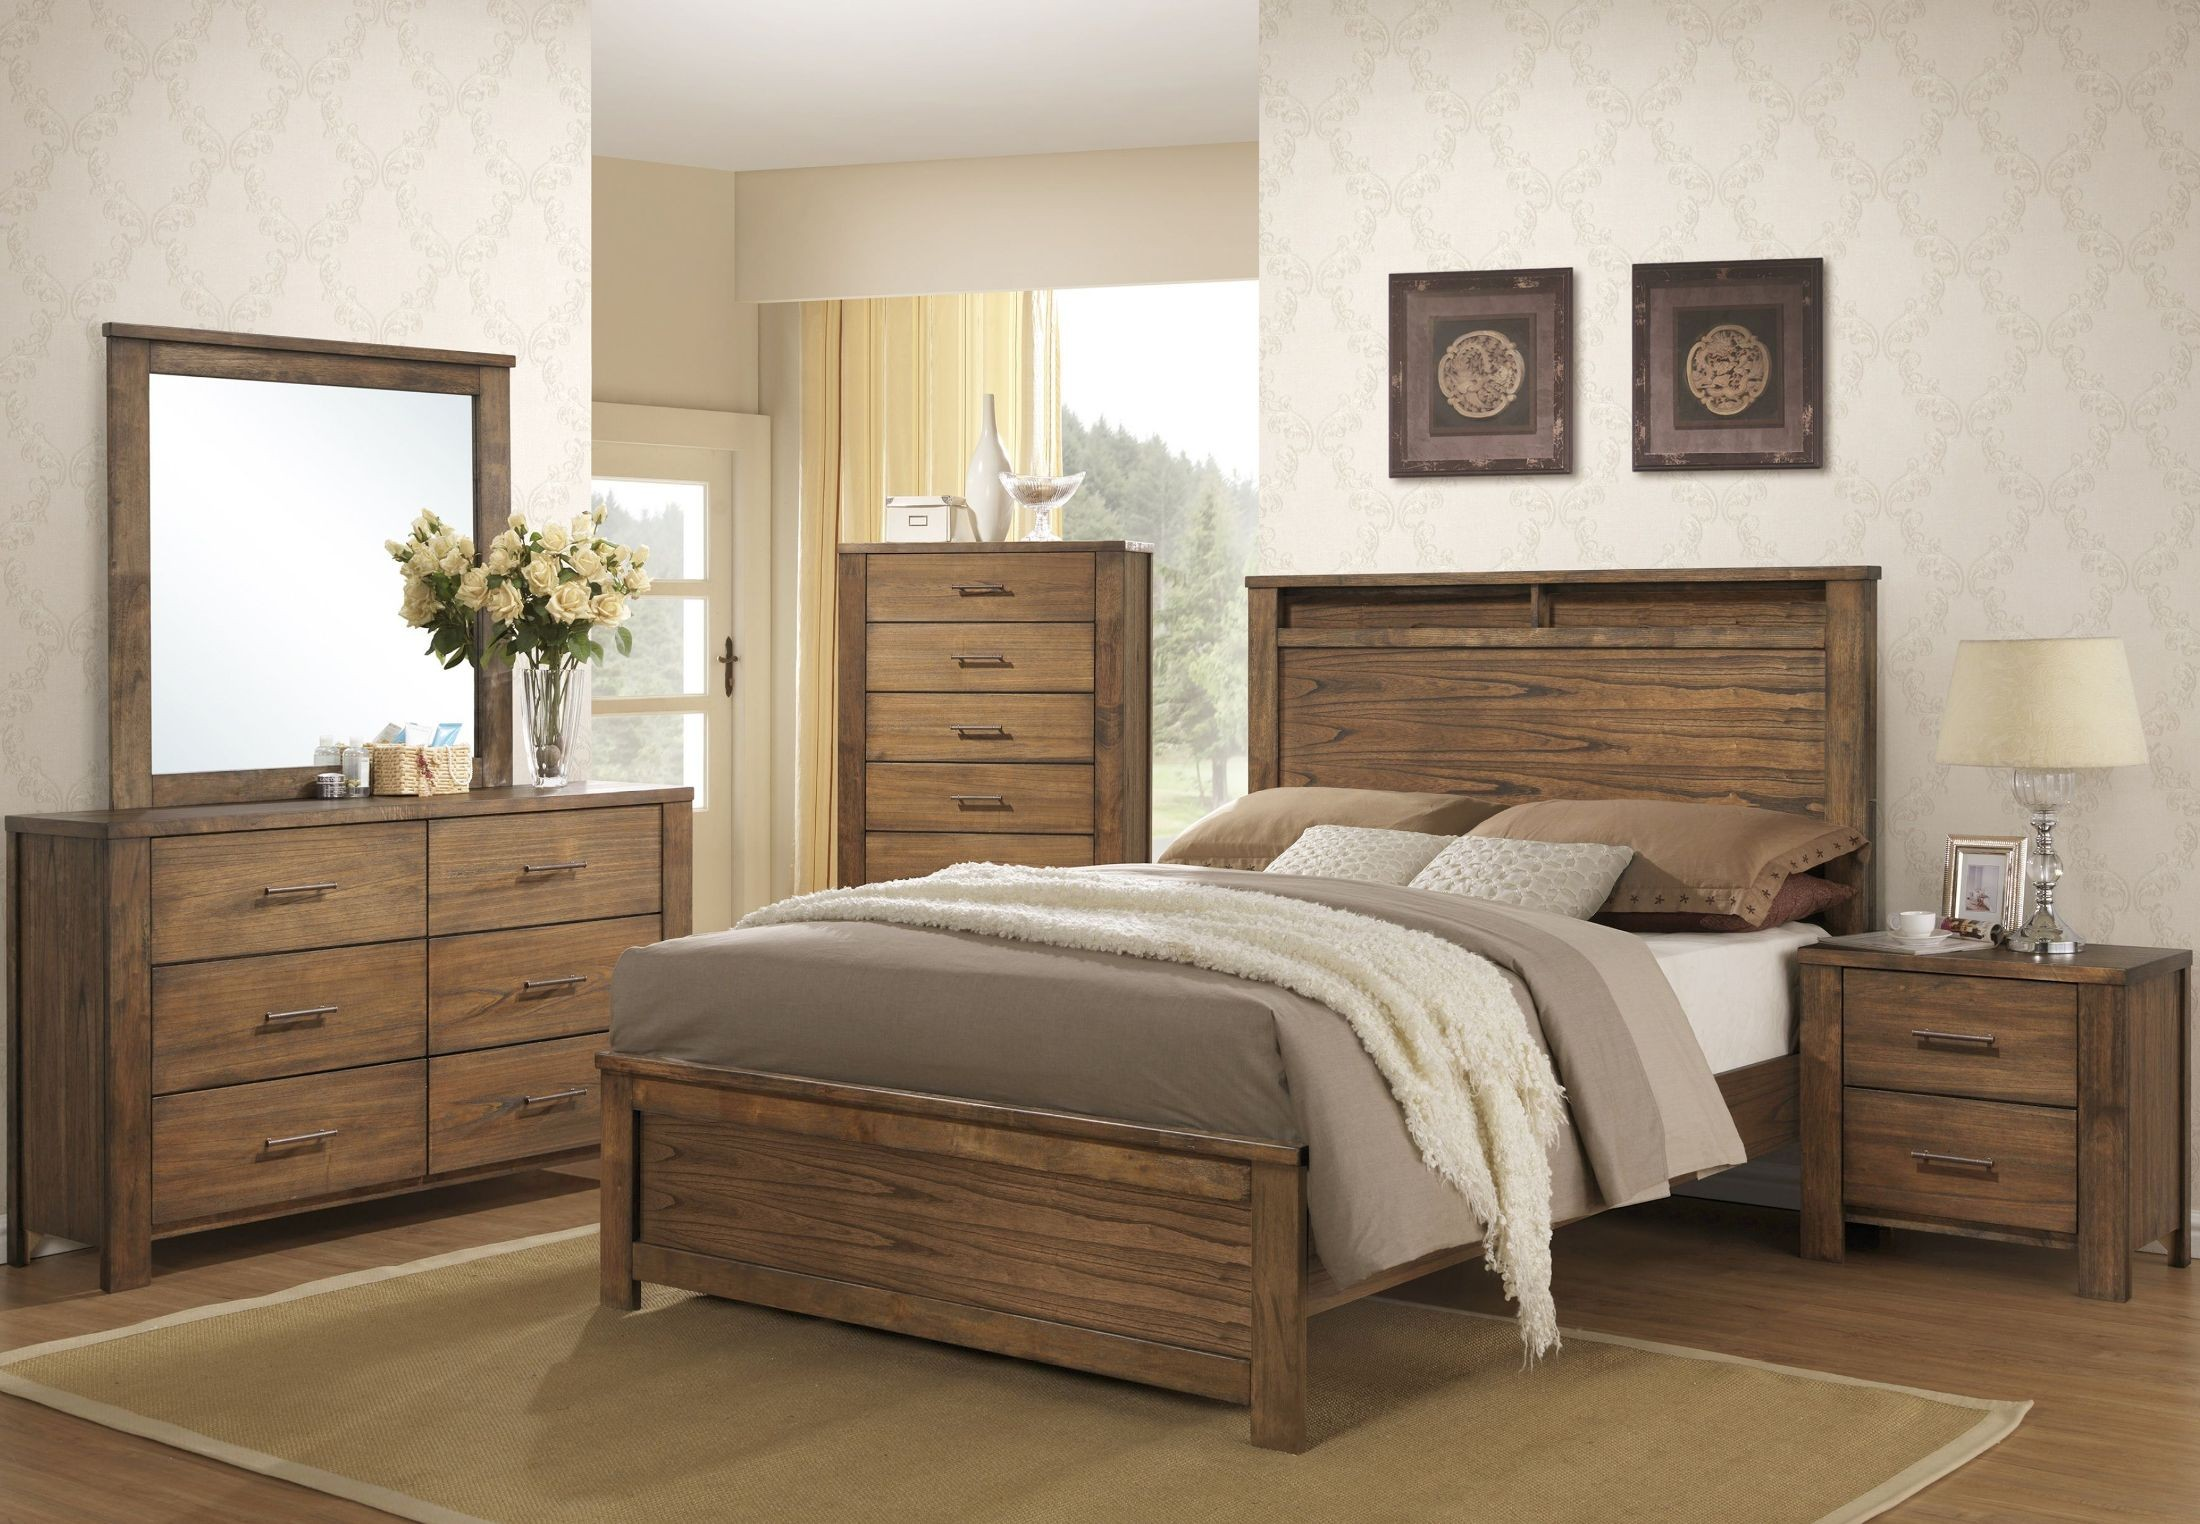 Brayden Distressed Satin Mindi Panel Bedroom Set From Progressive Furniture Coleman Furniture